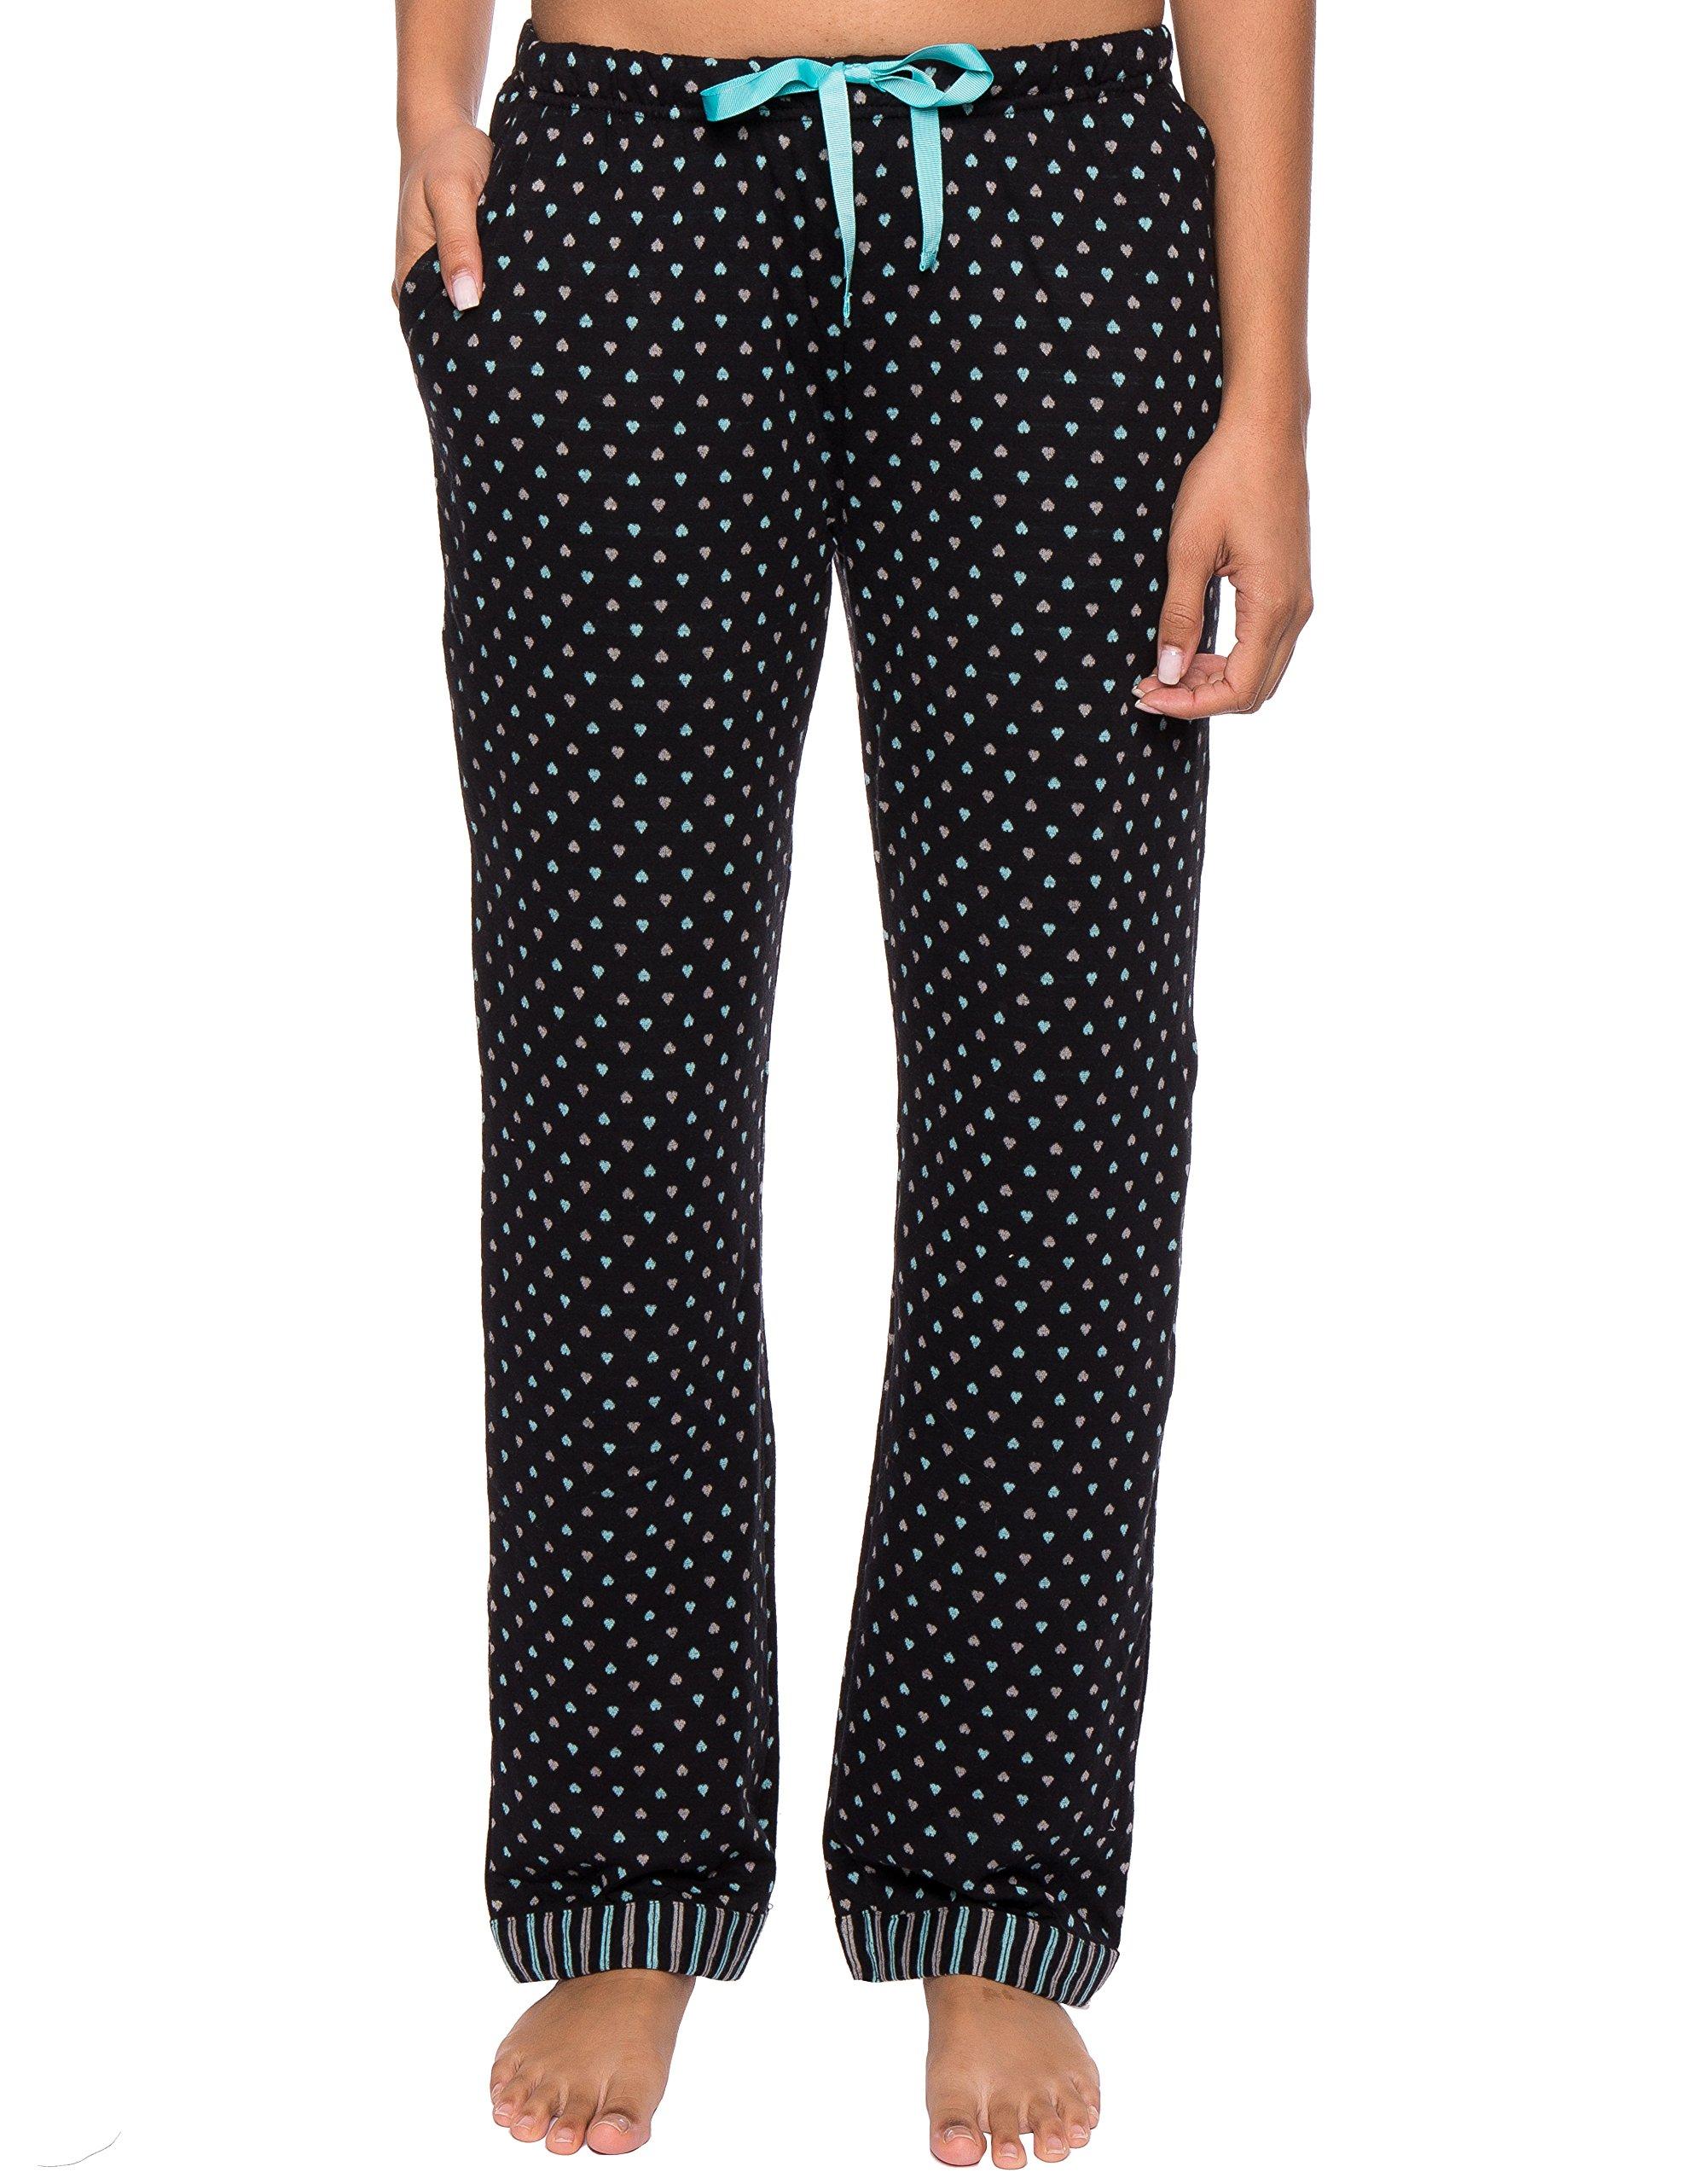 Noble Mount Women's Double Layer Jersey Lounge Pants, hearts, Black/Aqua, Large